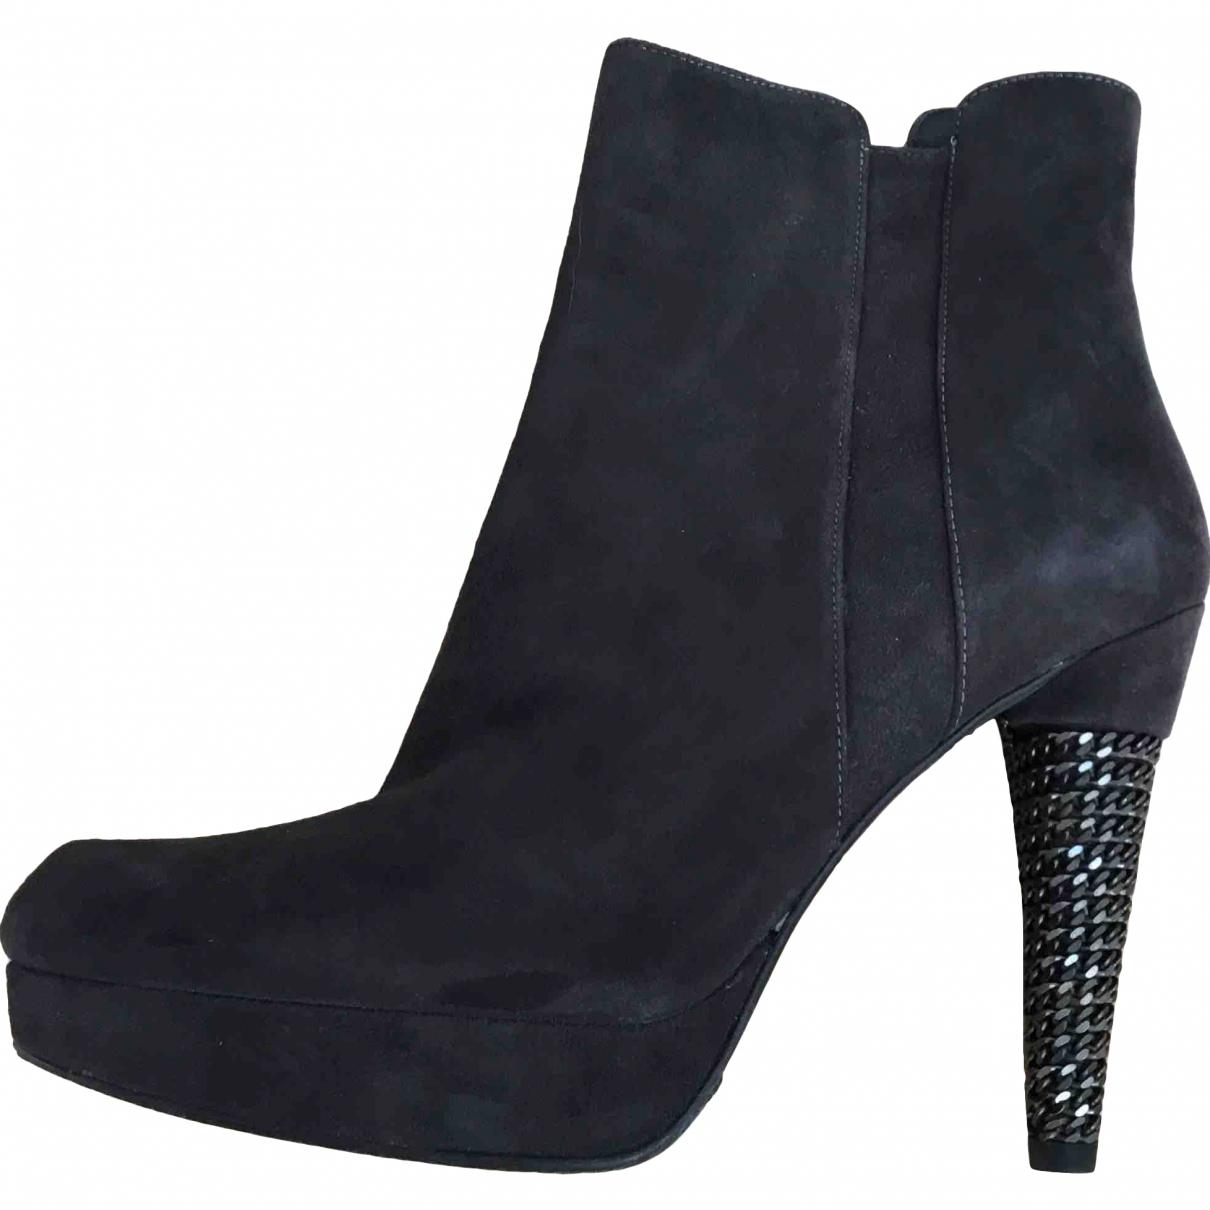 Stuart Weitzman \N Grey Suede Ankle boots for Women 37 EU